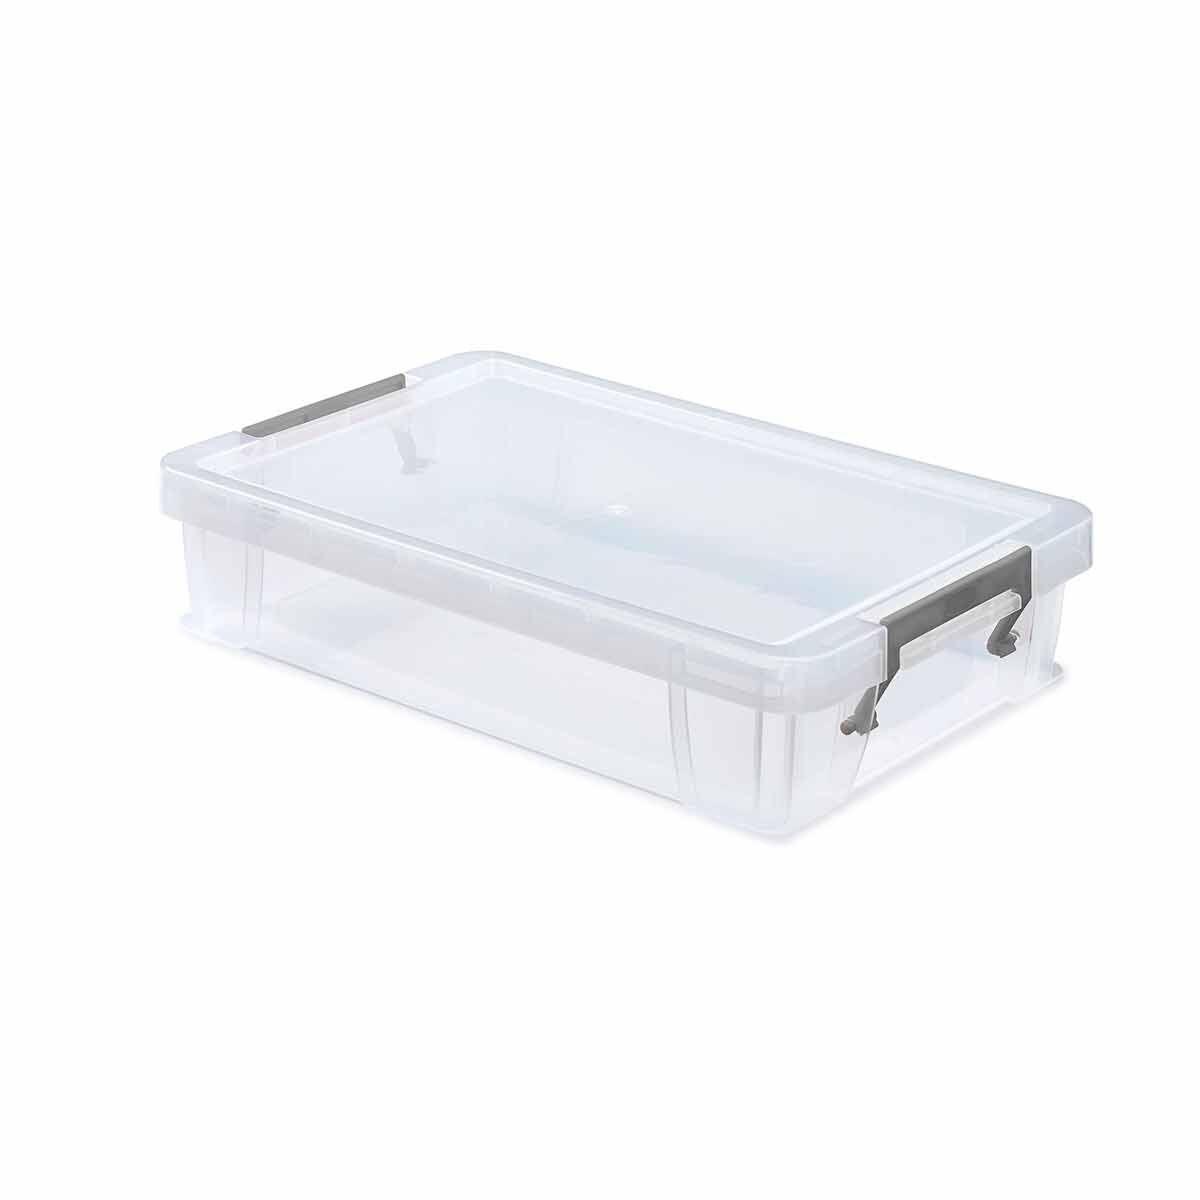 Whitefurze Allstore Plastic Storage Box 5.5 Litre